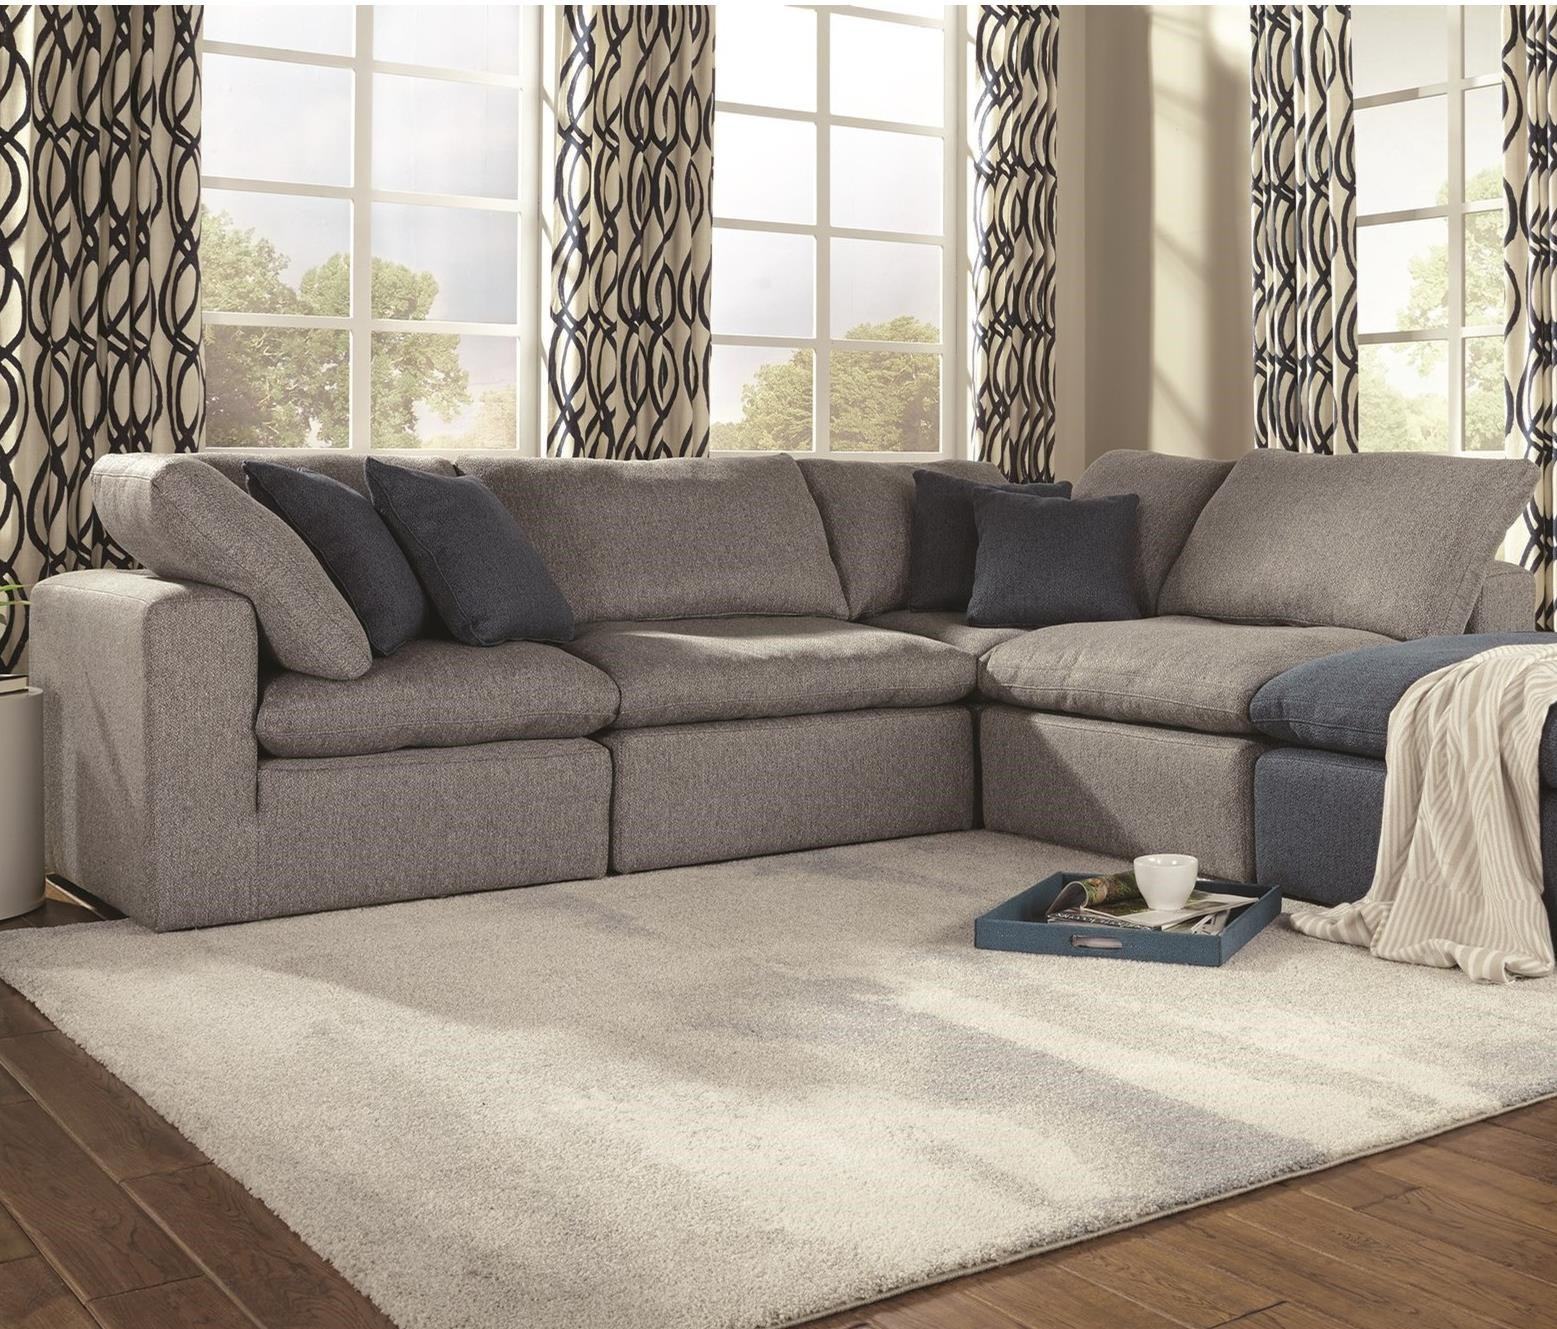 Wondrous Palliser Bloom Casual 4 Seat Sectional Sofa With Reversible Customarchery Wood Chair Design Ideas Customarcherynet